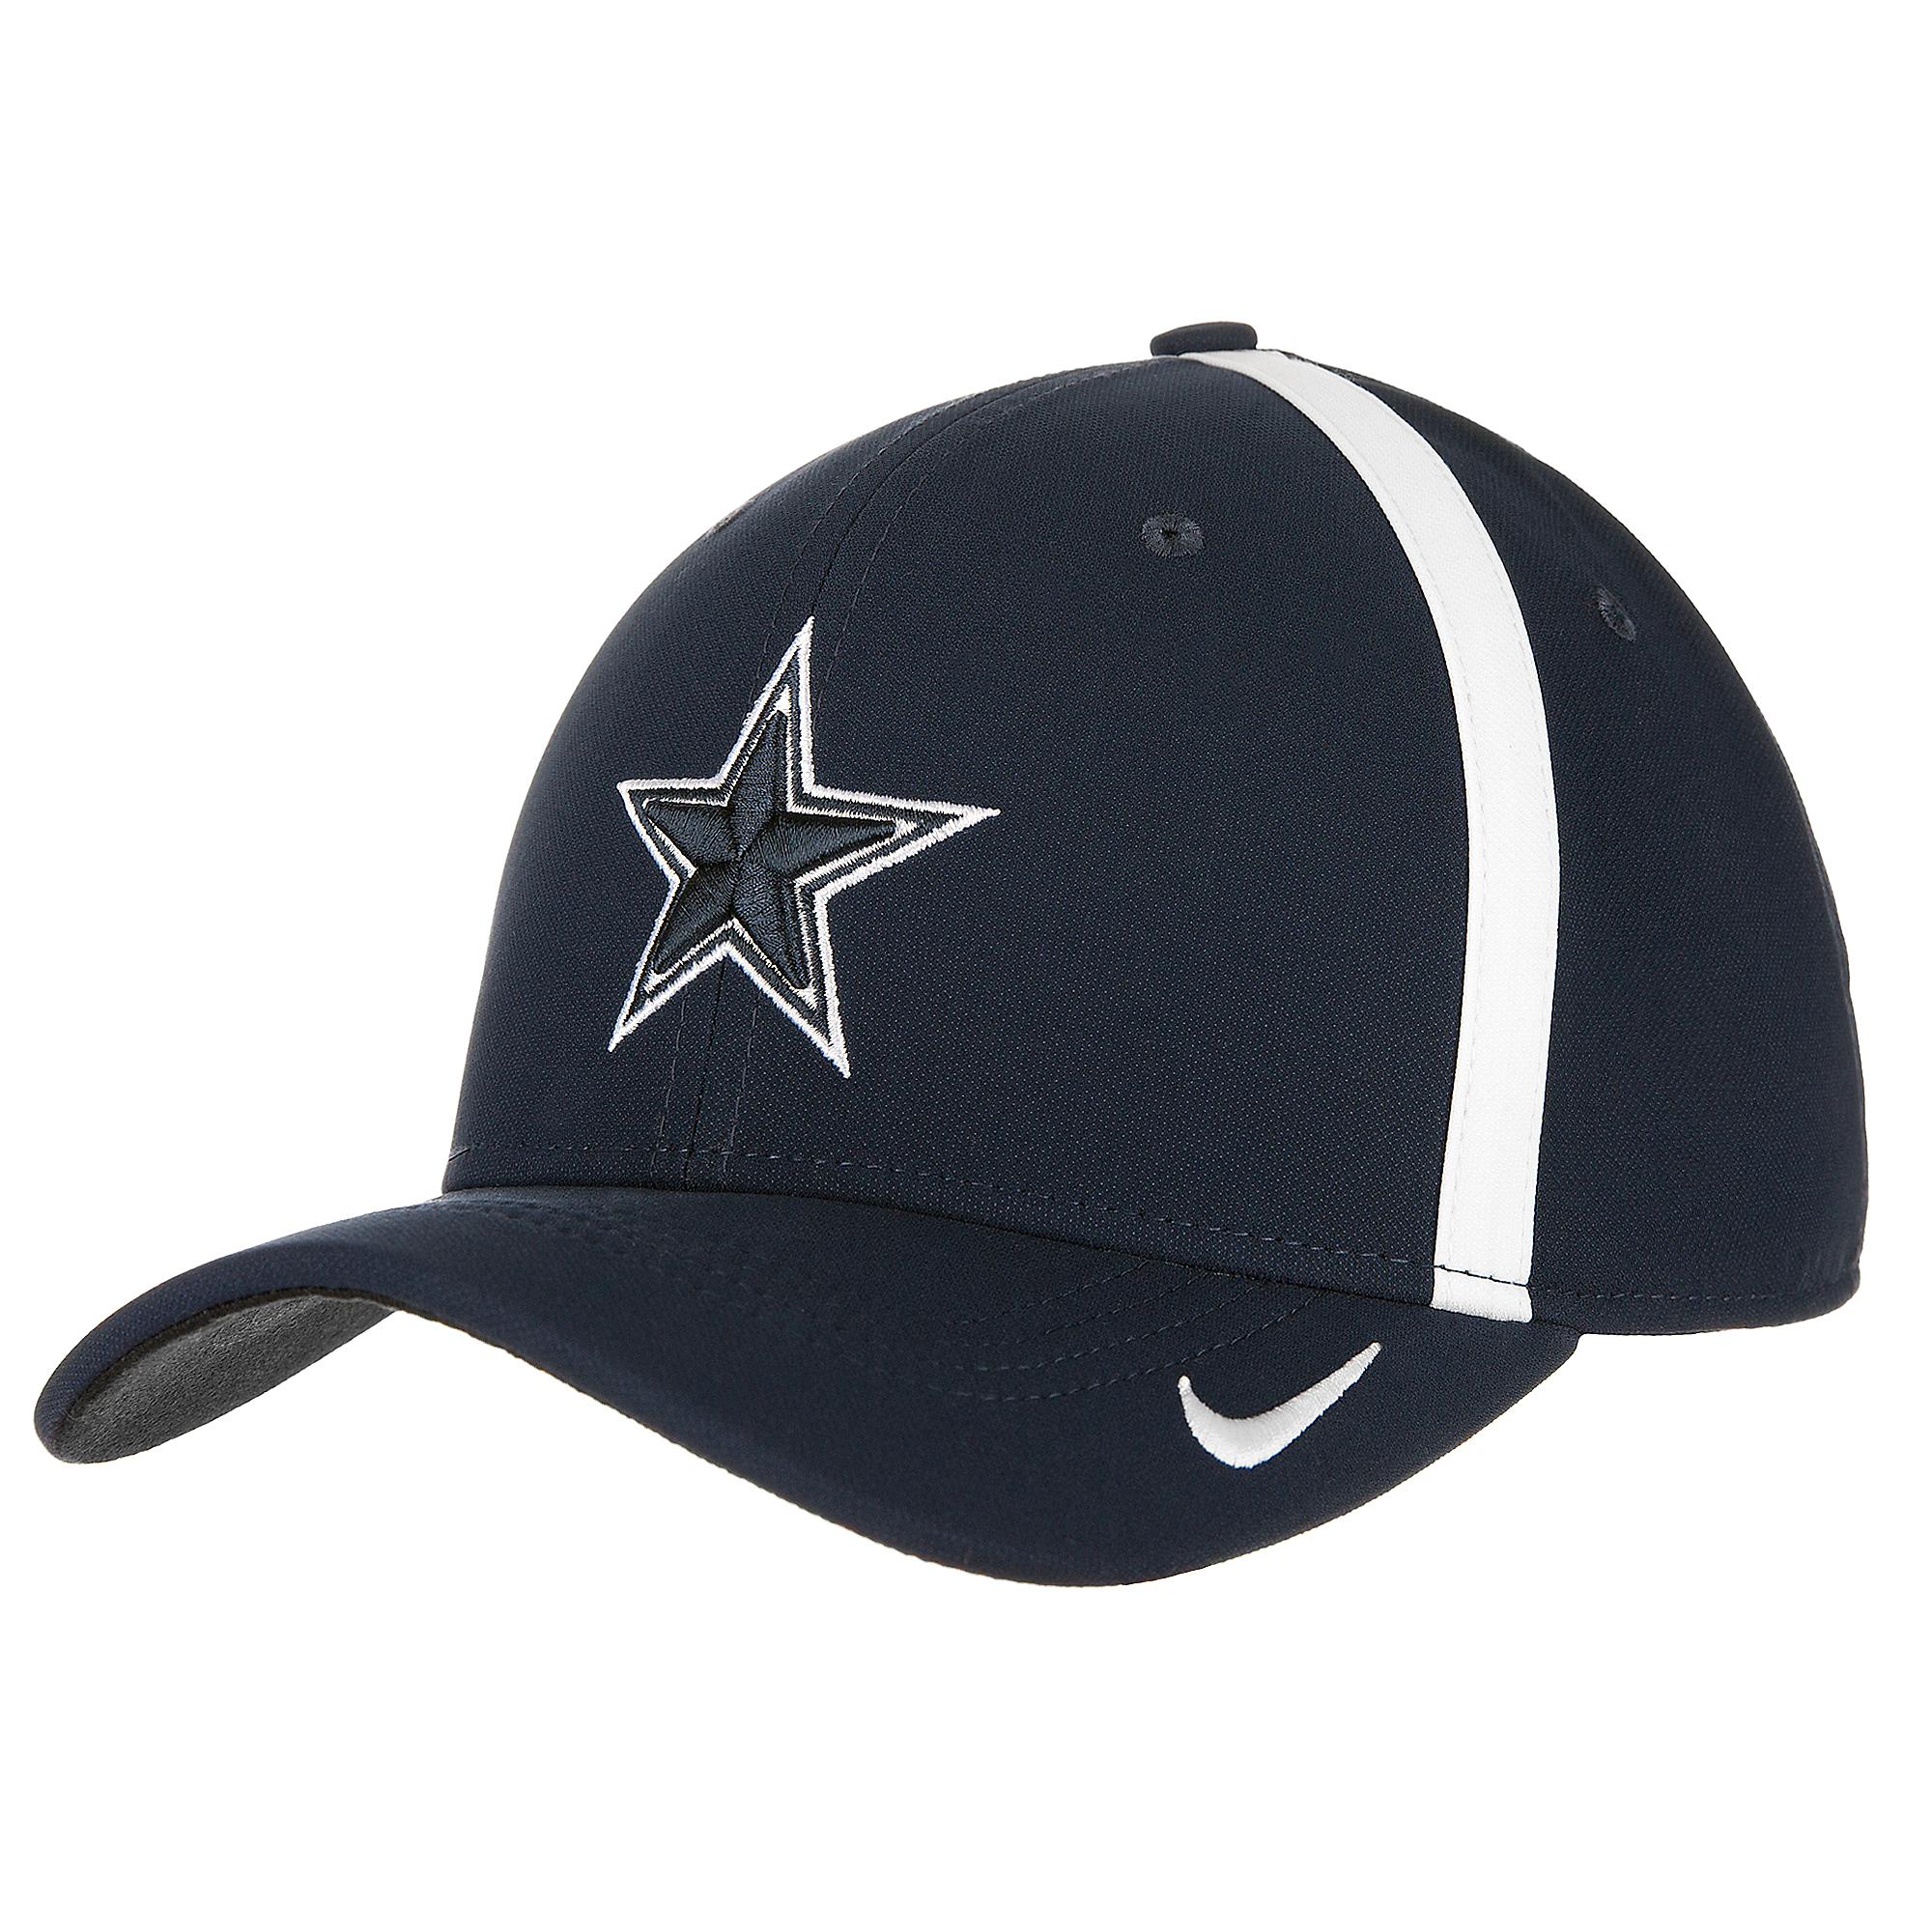 71ad85499aed7e Dallas Cowboys Nike Classic 99 Aerobill Star Swooshflex Cap | Fans ...